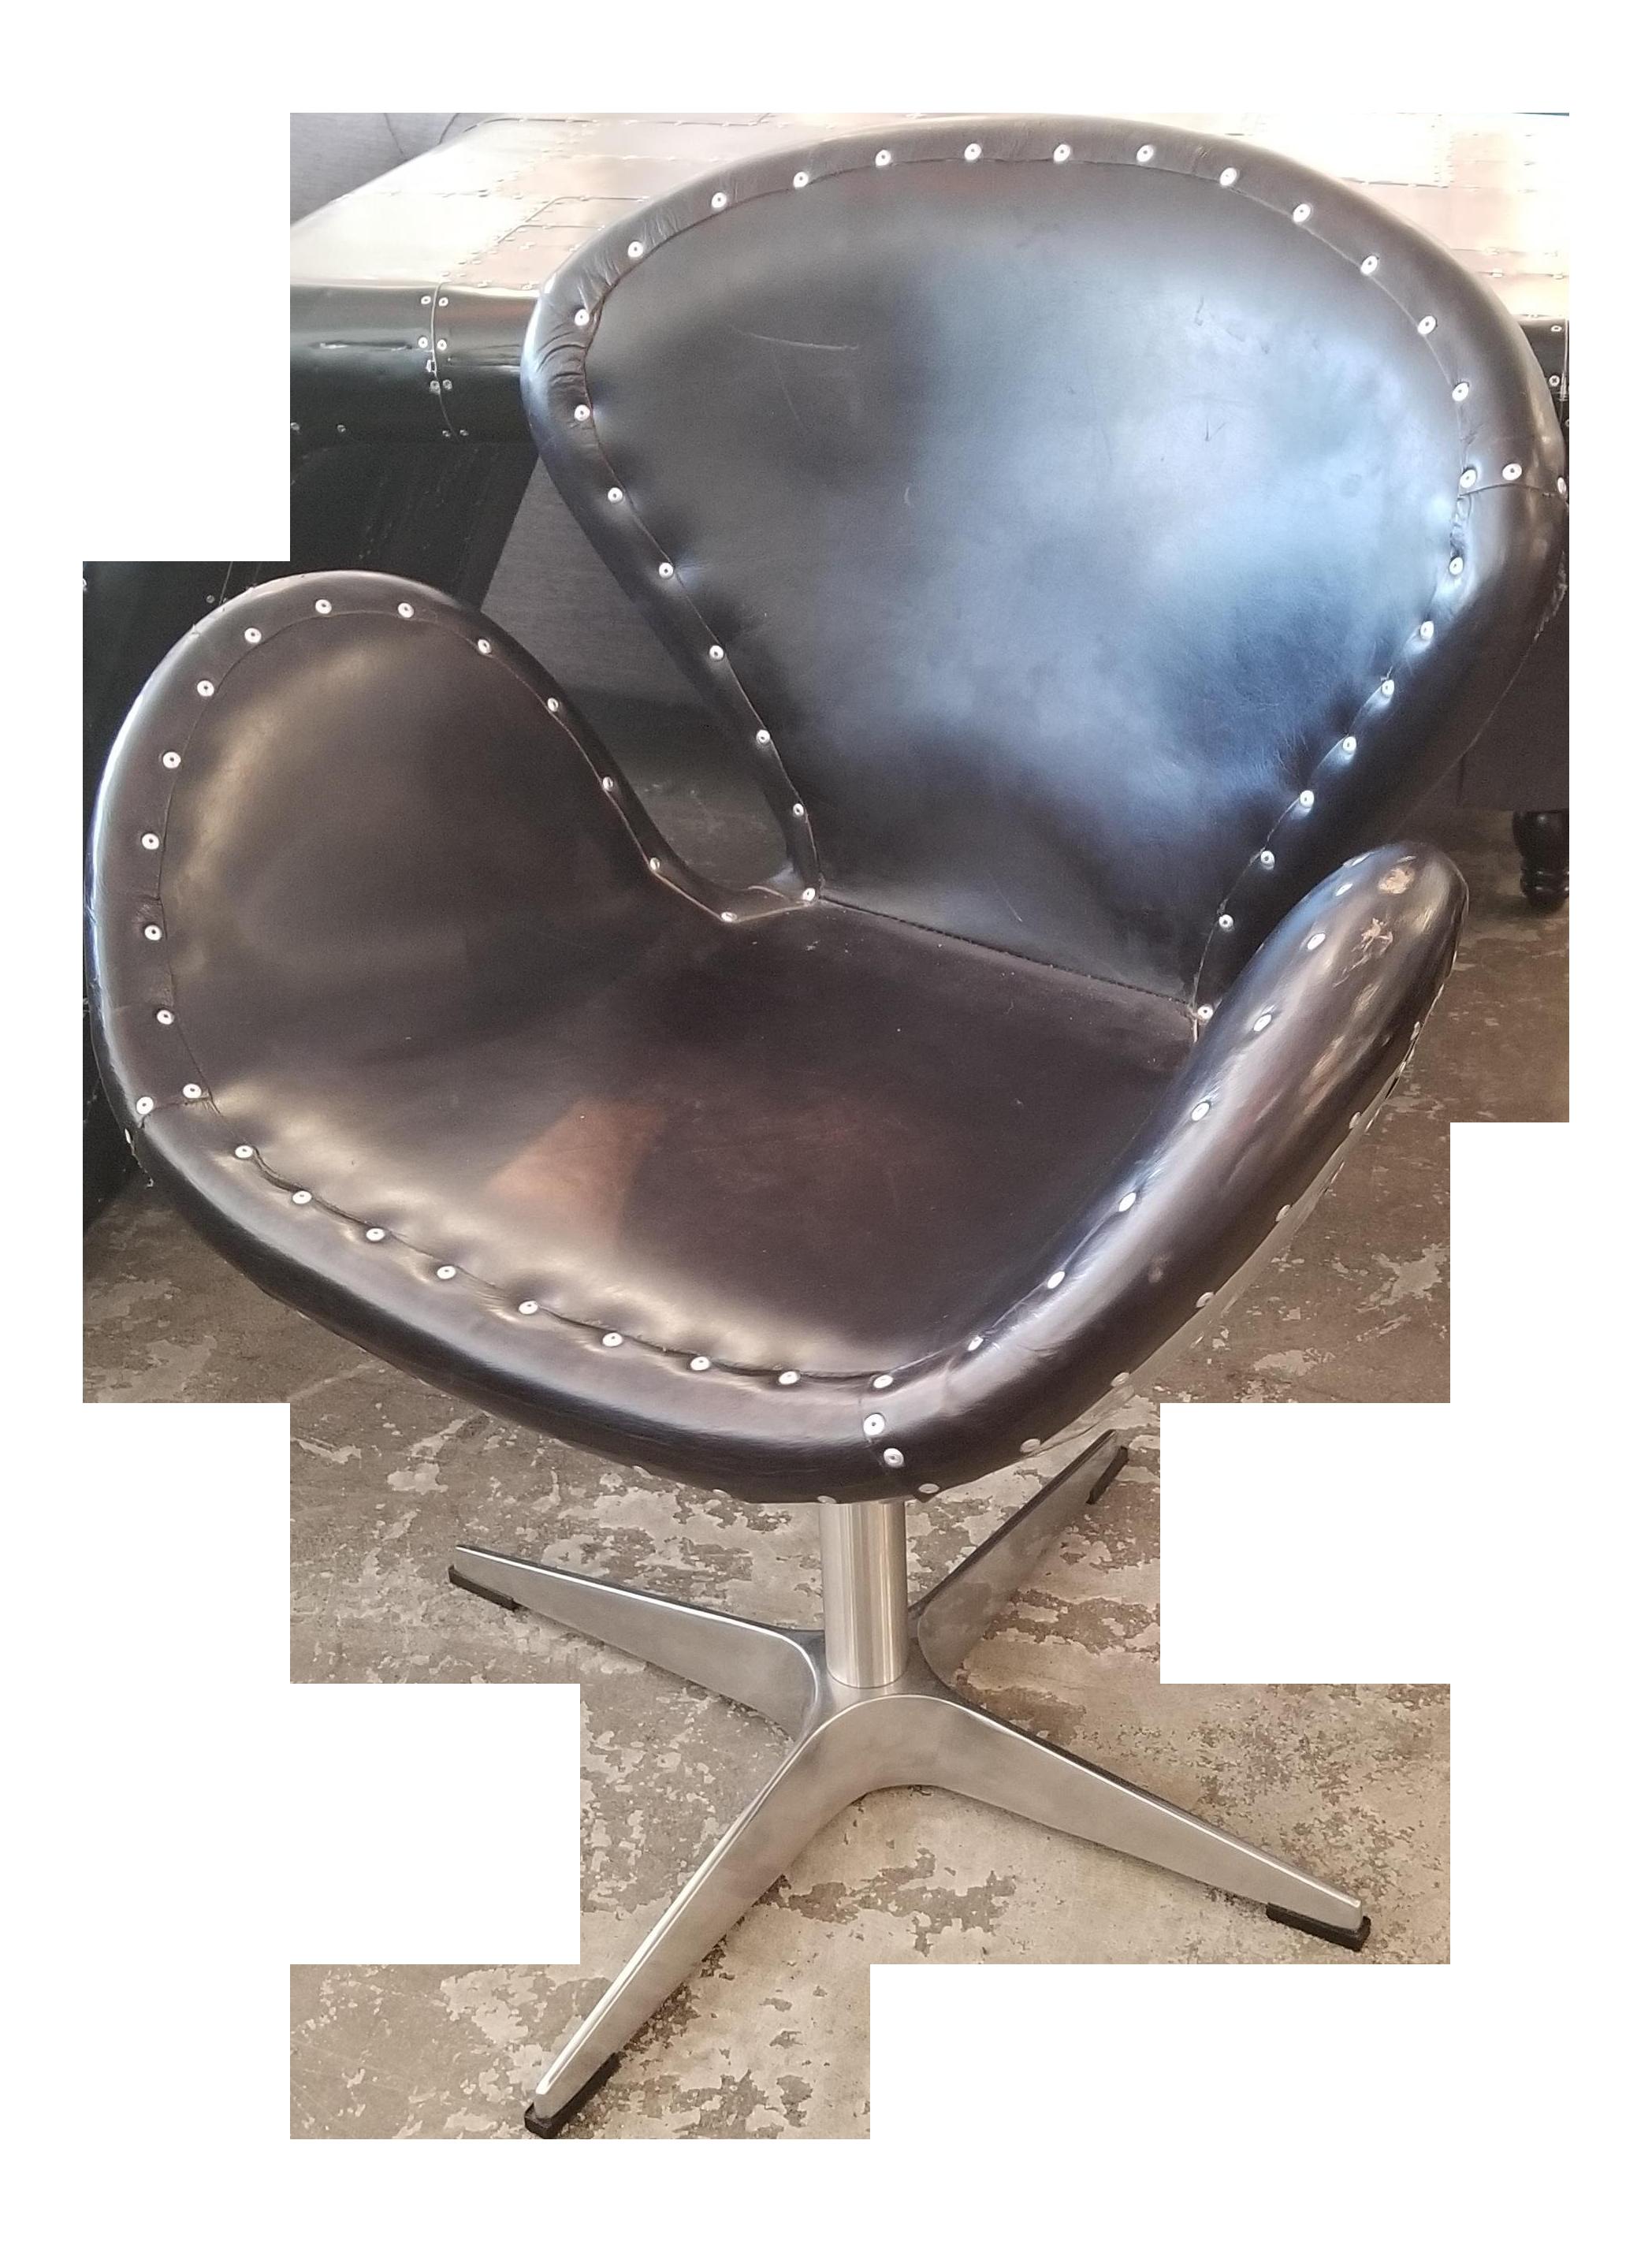 Industrial office chair Modern Restoration Hardware Metal Black Leather Aviator Office Chair Chairish Vintage Used Industrial Office Chairs Chairish